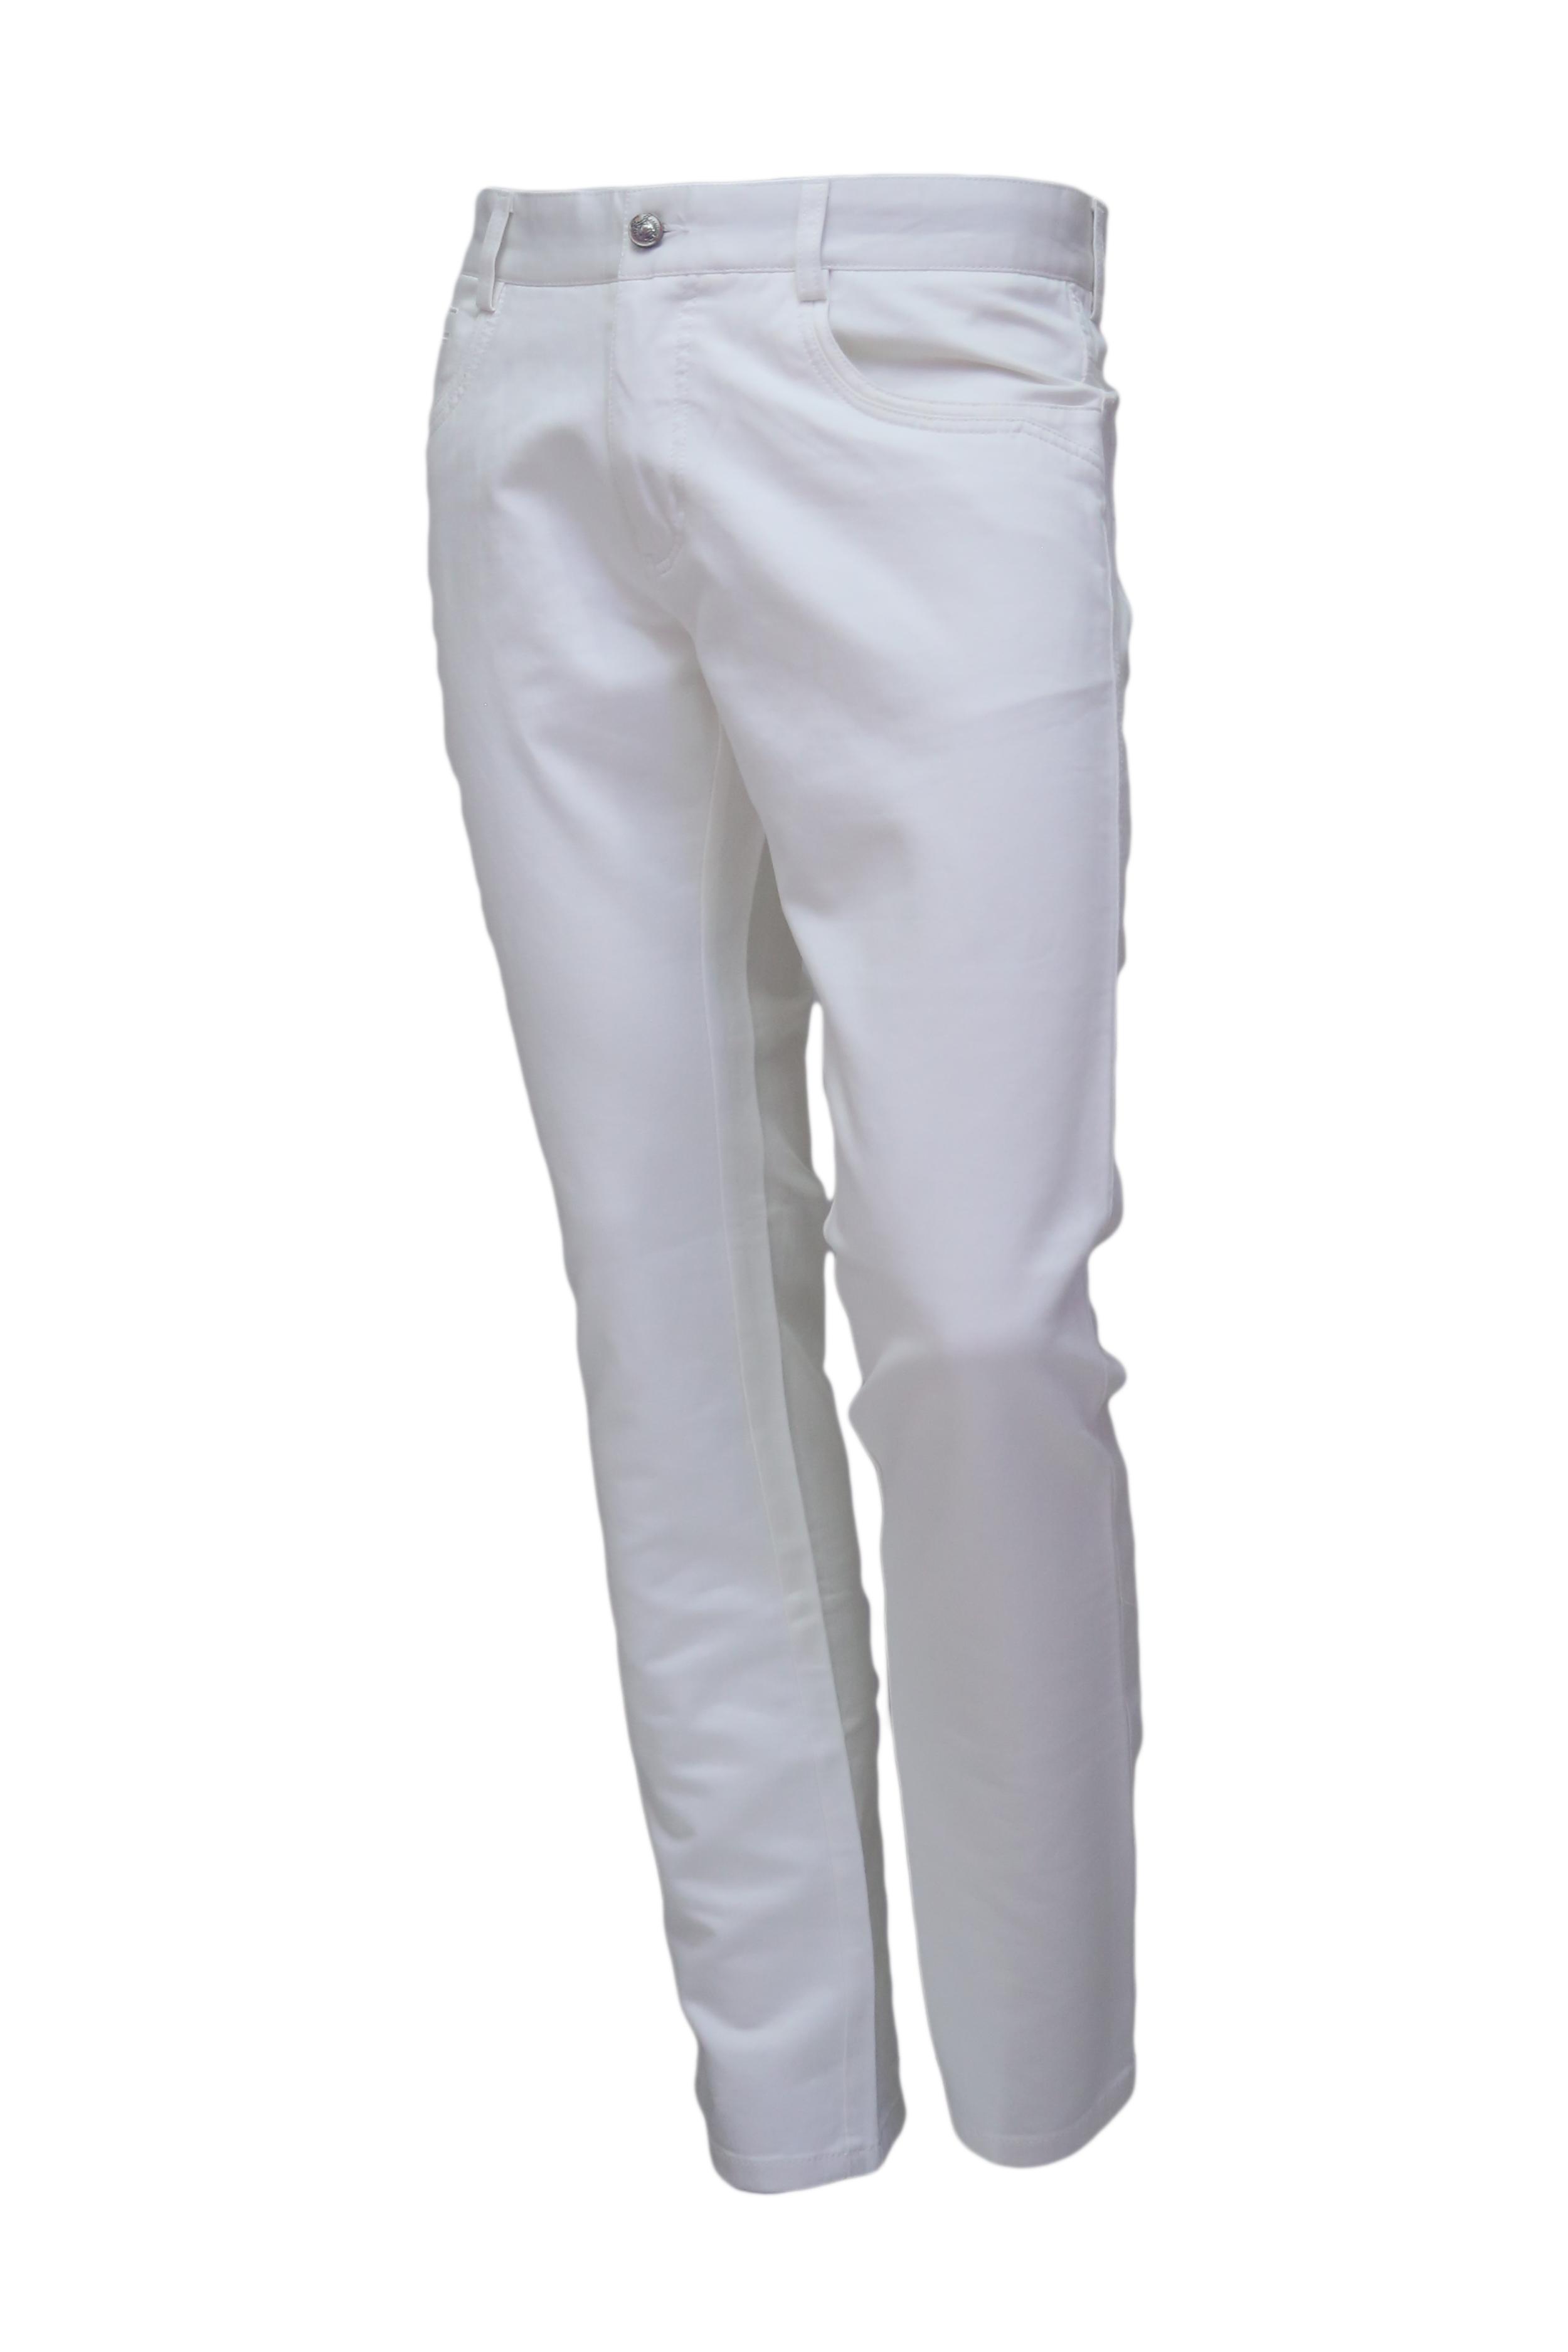 4 Pants.png